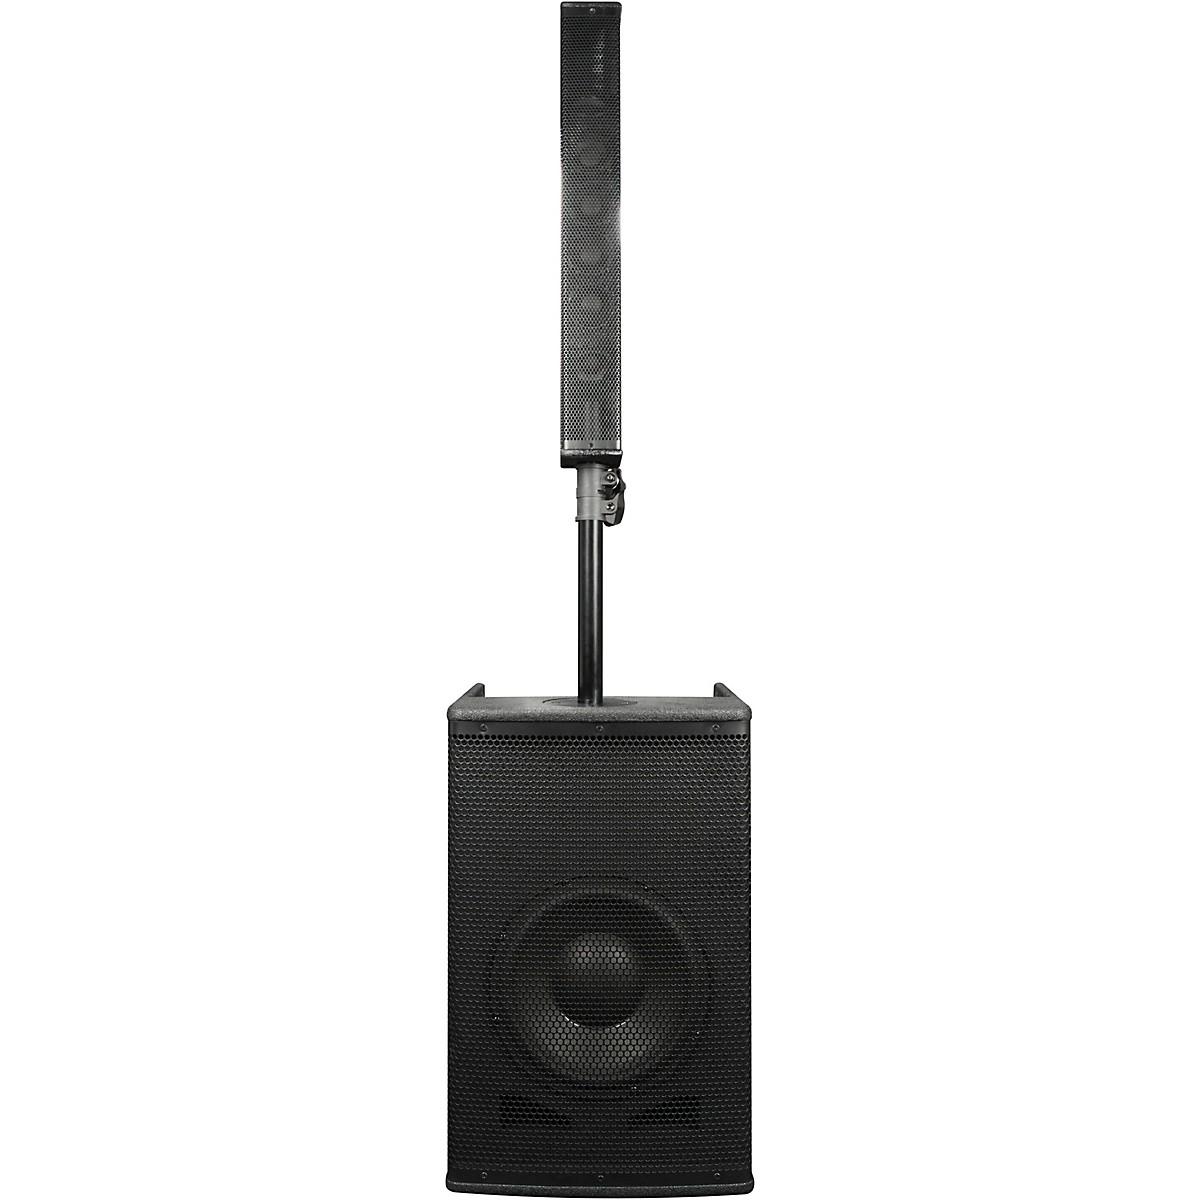 American Audio STK -106W Portable Column Line Array PA System